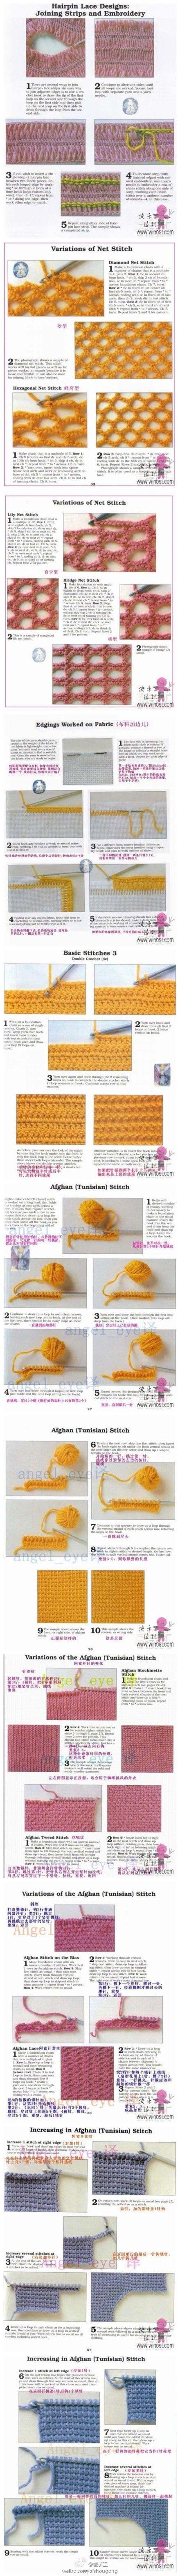 ♡ Different crochete stitches and techniques.